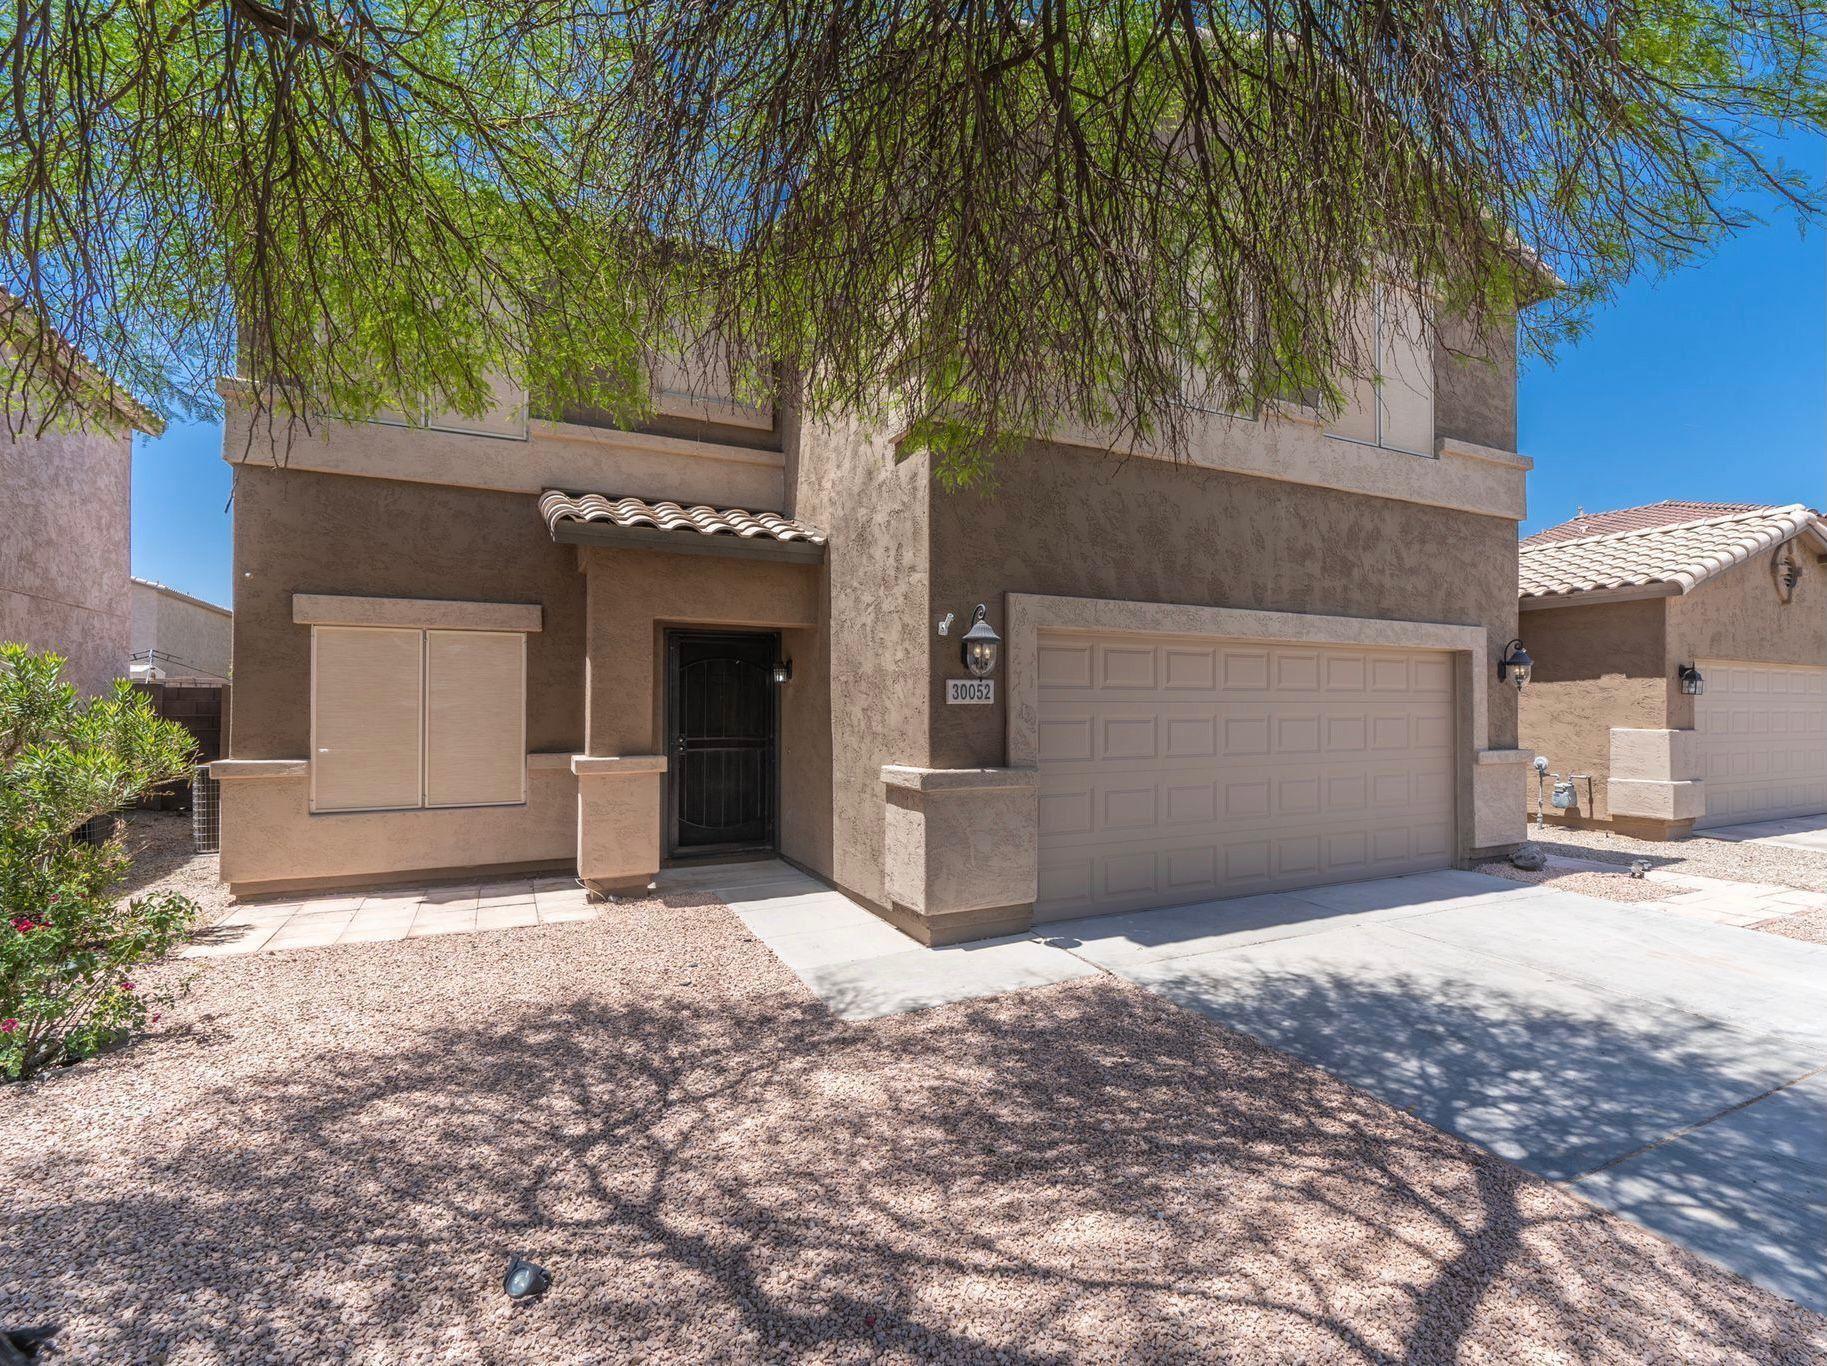 30052 N DESERT WILLOW Boulevard, San Tan Valley, AZ 85143 - MLS#: 6234933